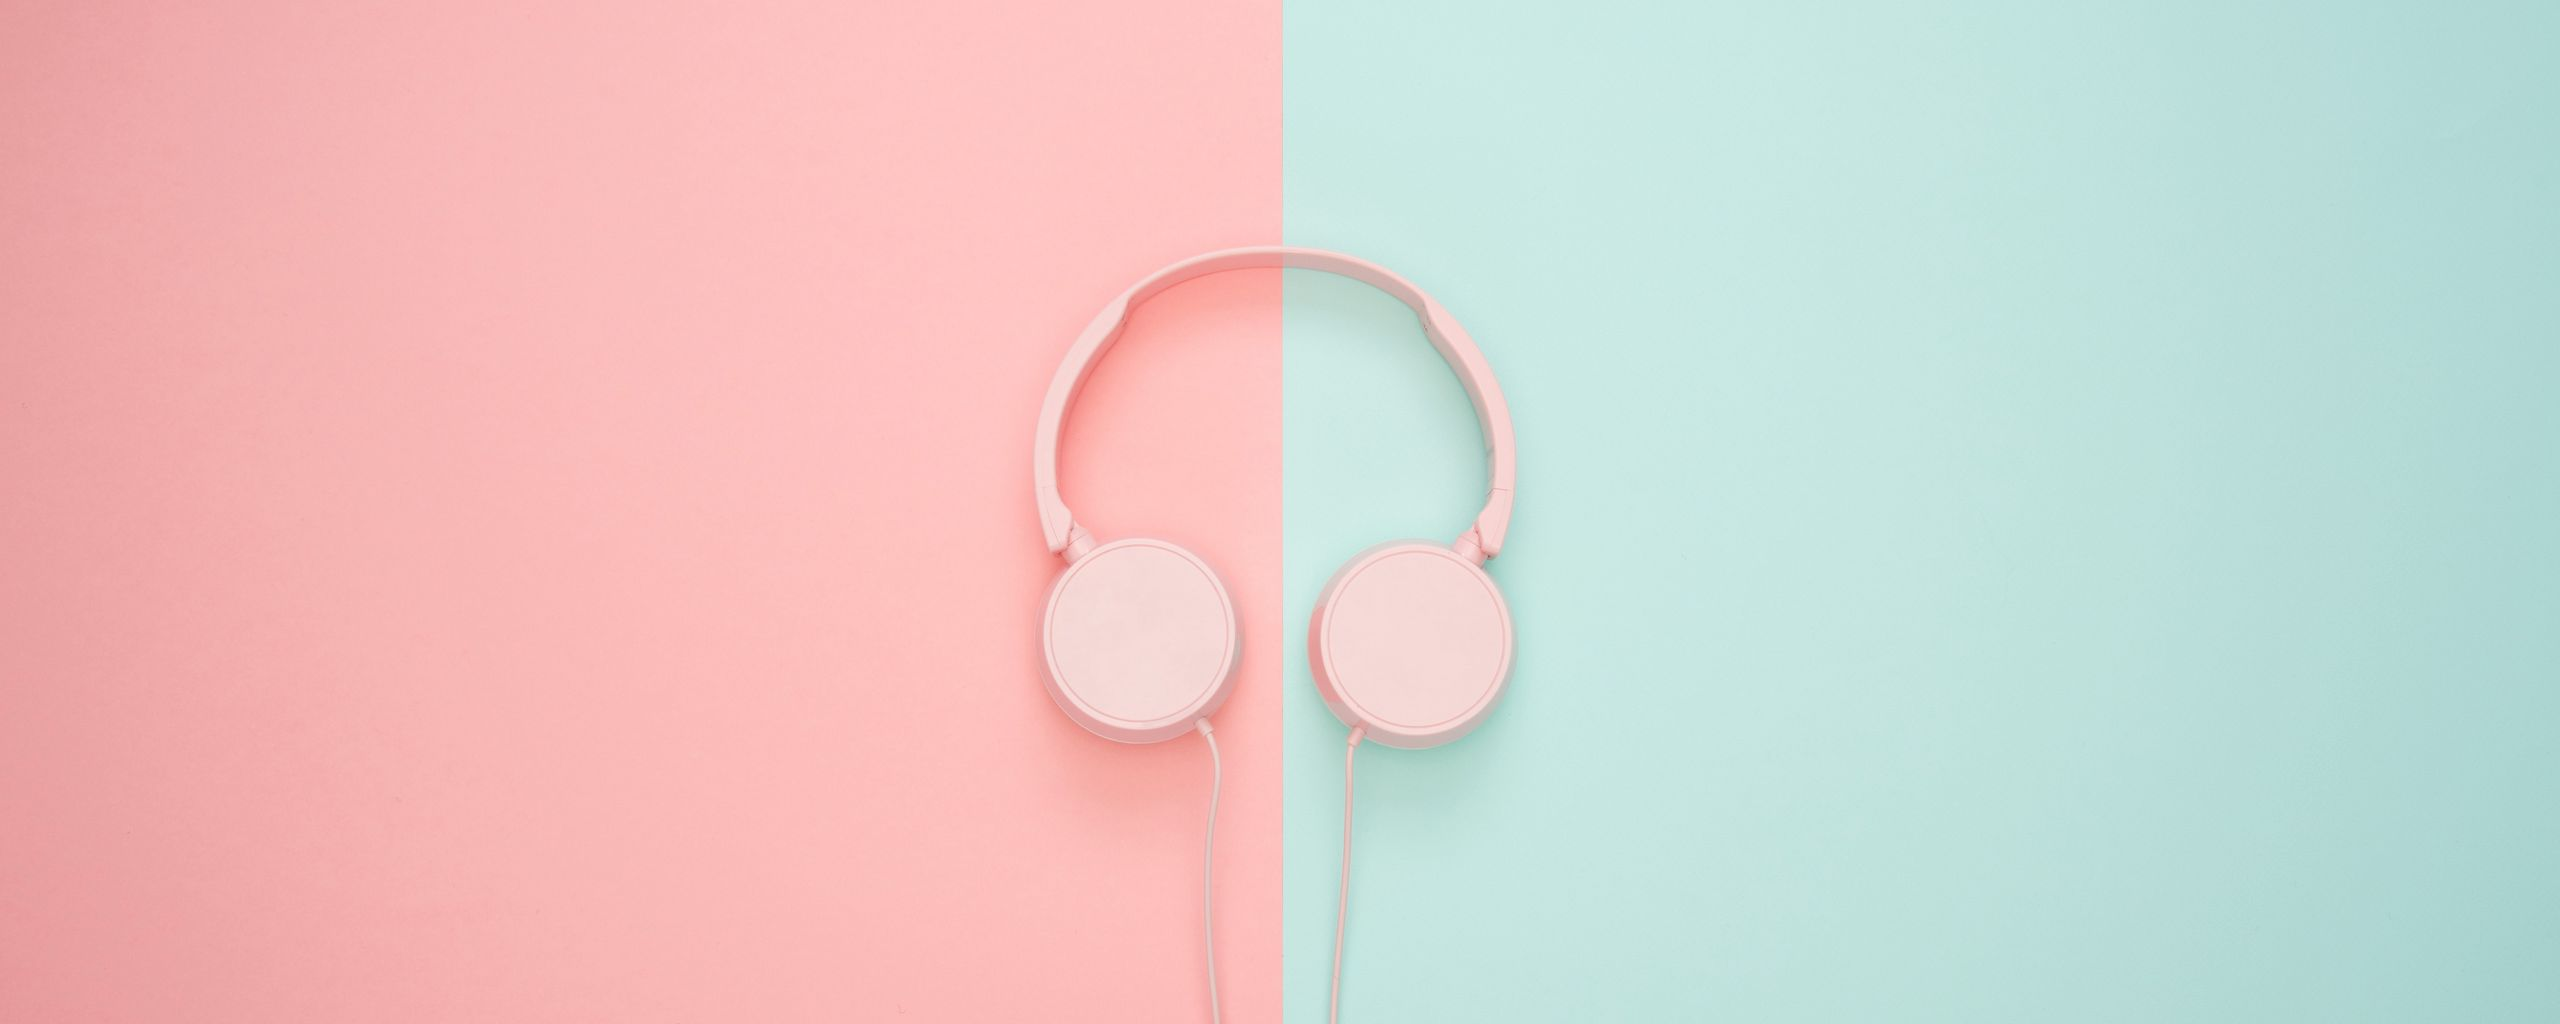 2560x1024 Wallpaper headphones, minimalism, pink, pastel